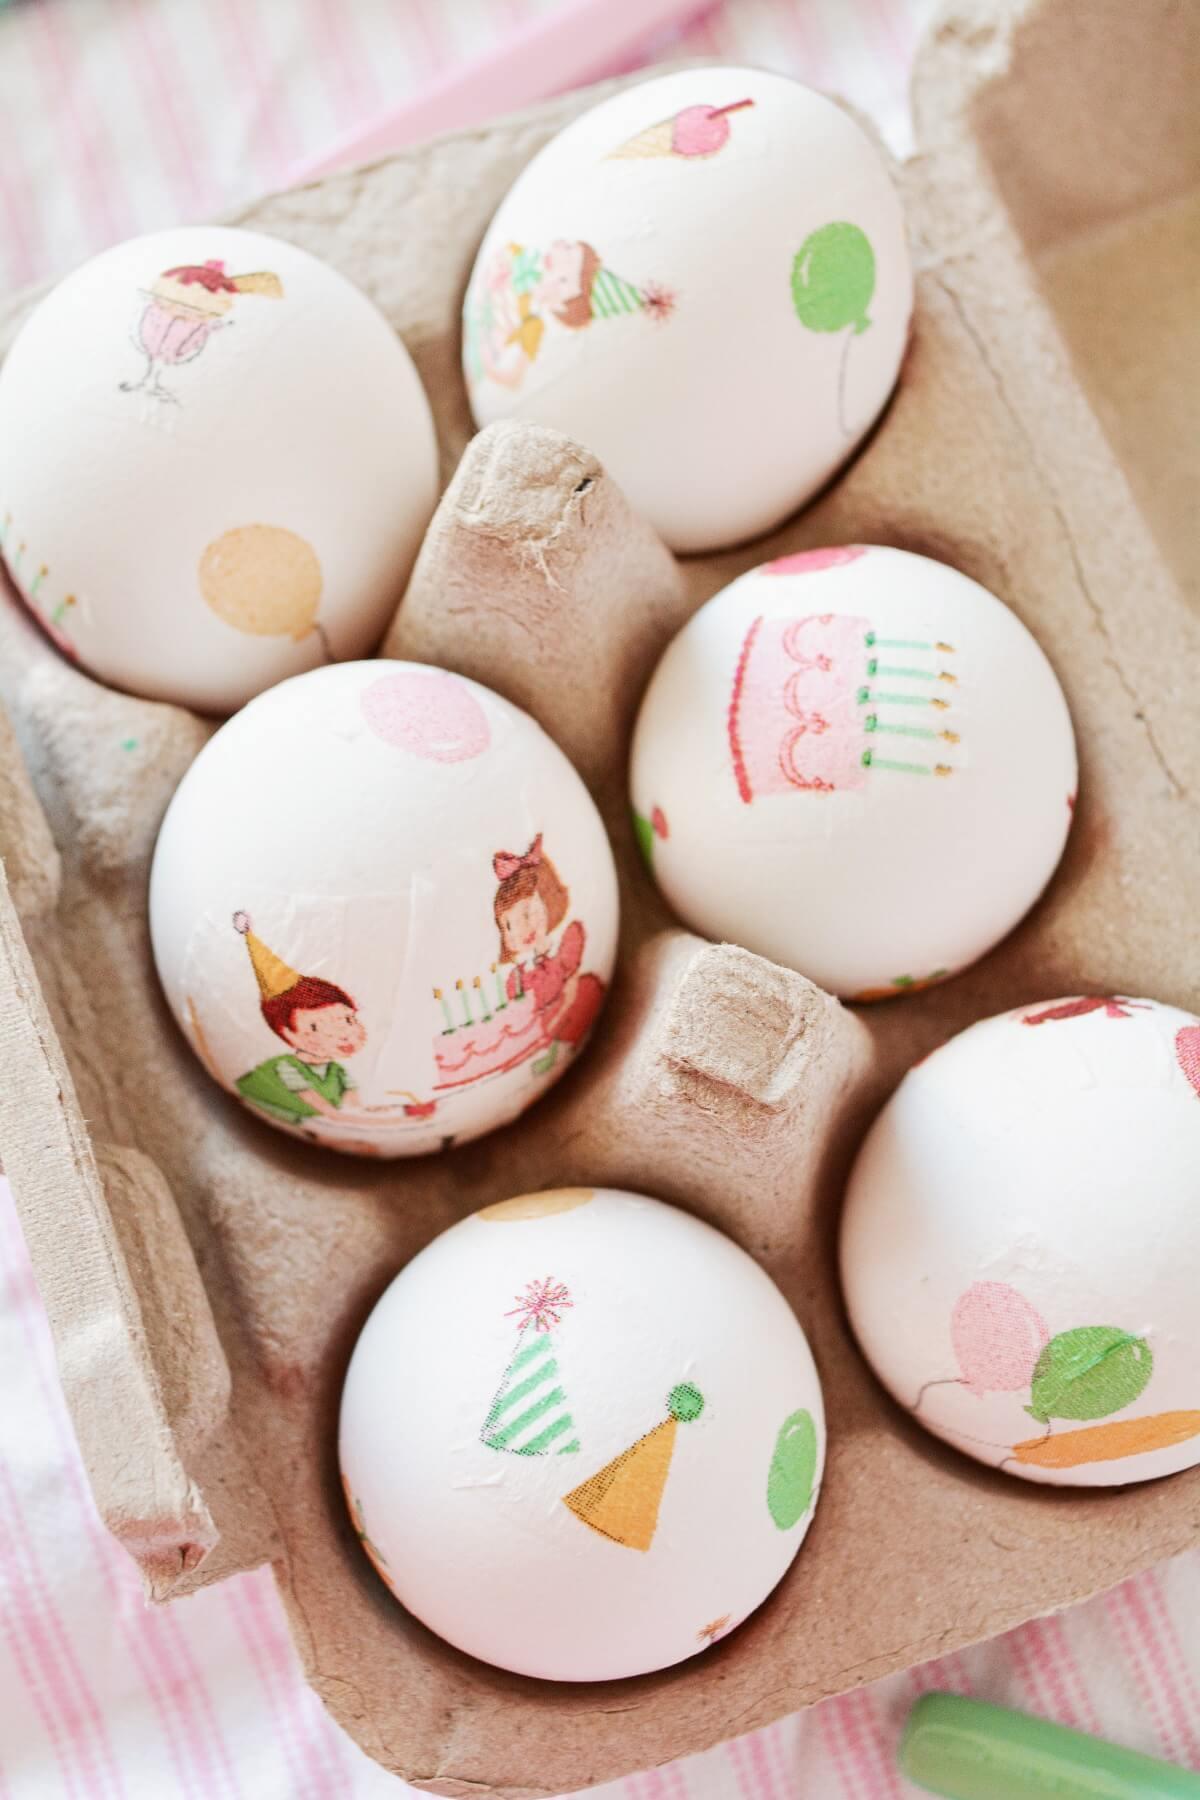 Decoupaged Easter eggs in a cardboard carton.